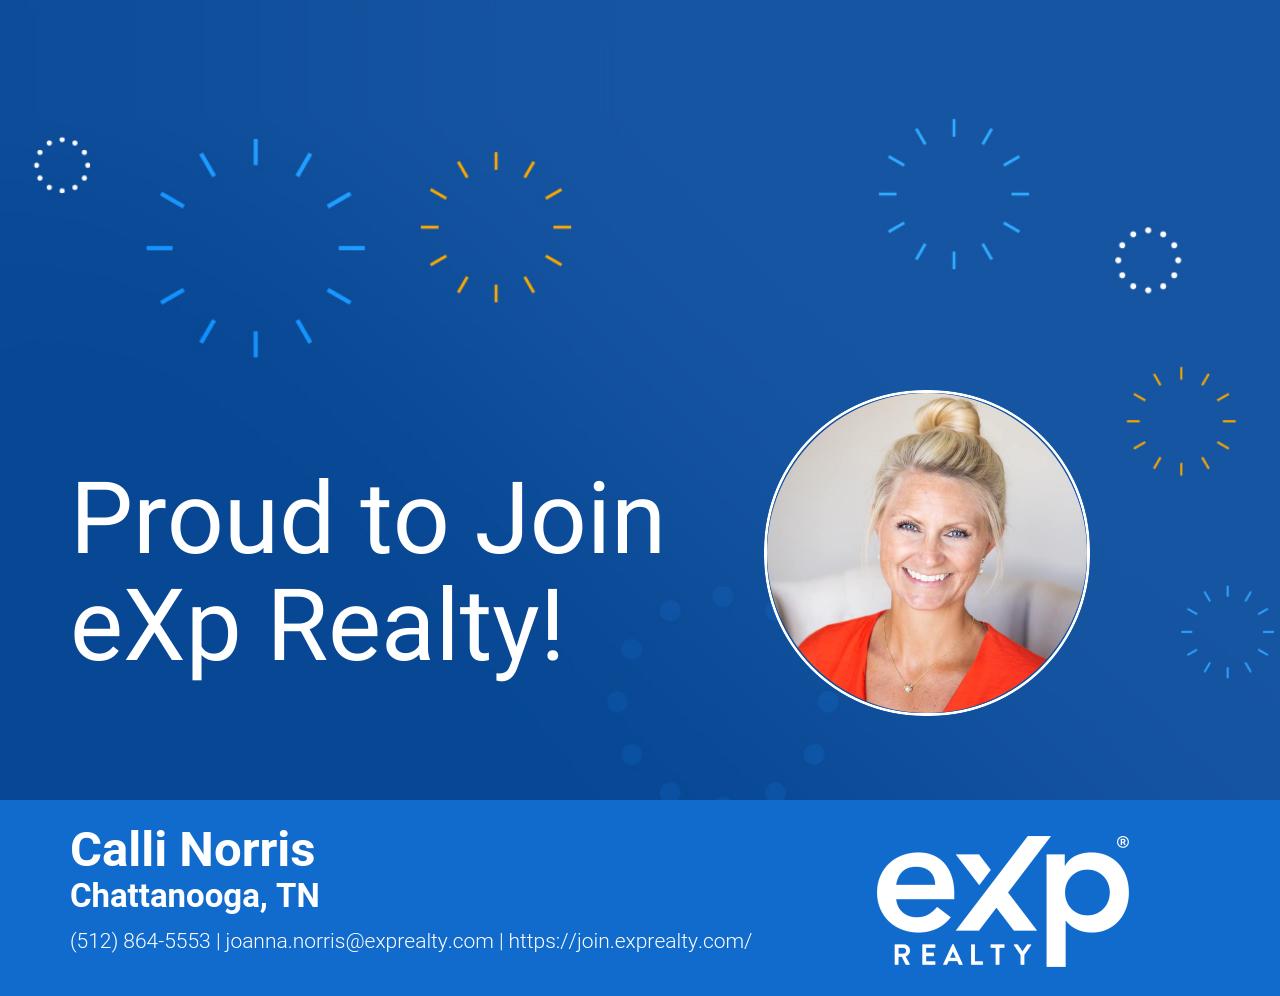 eXp Realty Welcomes Calli Norris!